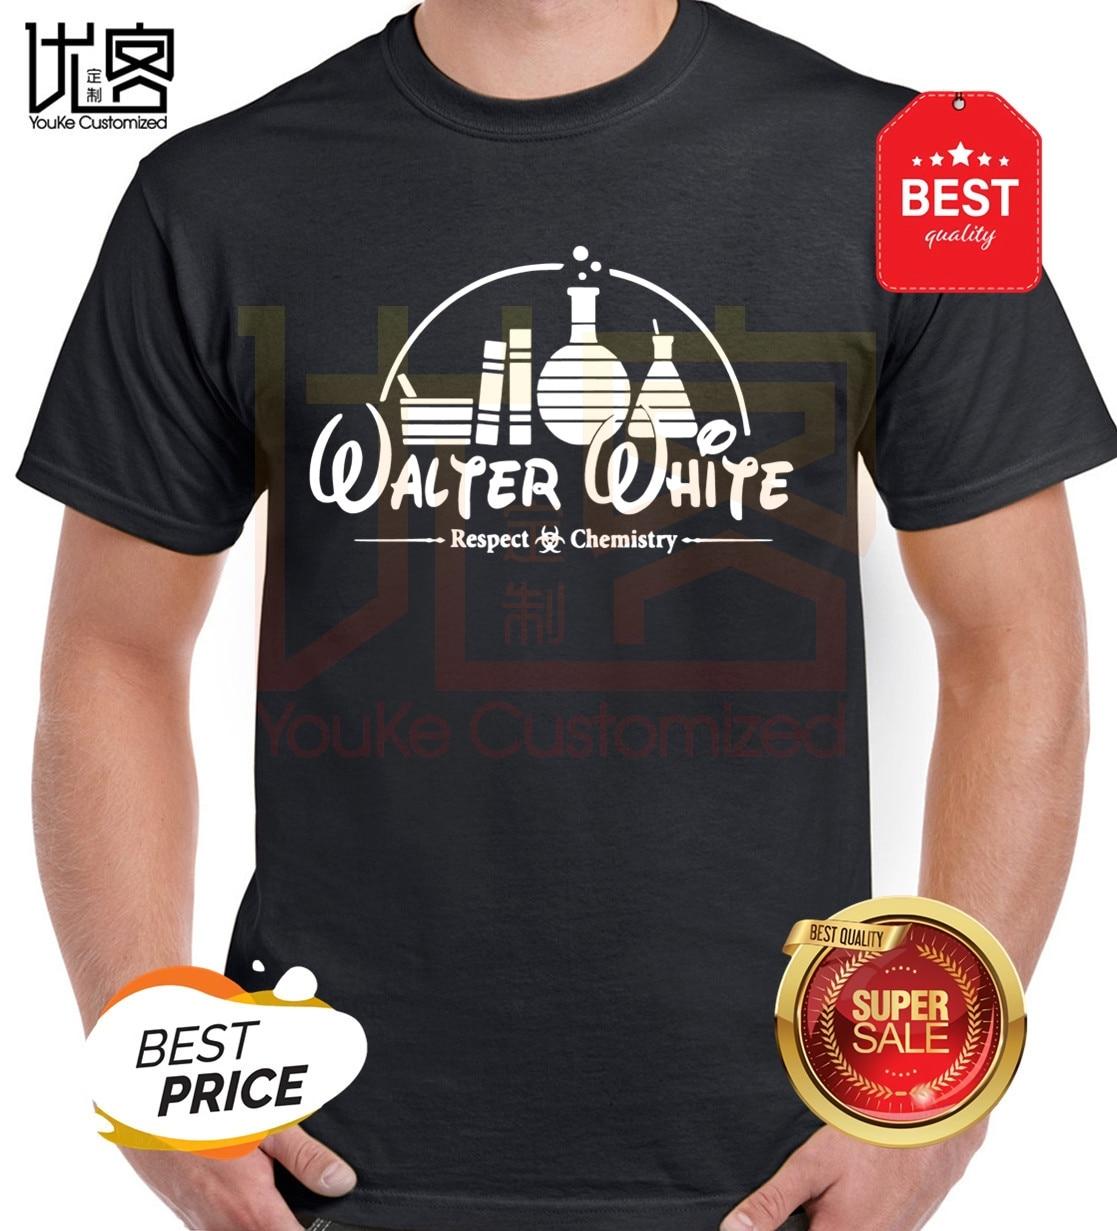 100% de algodón casual breaking bad hombres camiseta pantalón corto casual manga camiseta Tops Heisenberg hombres camiseta